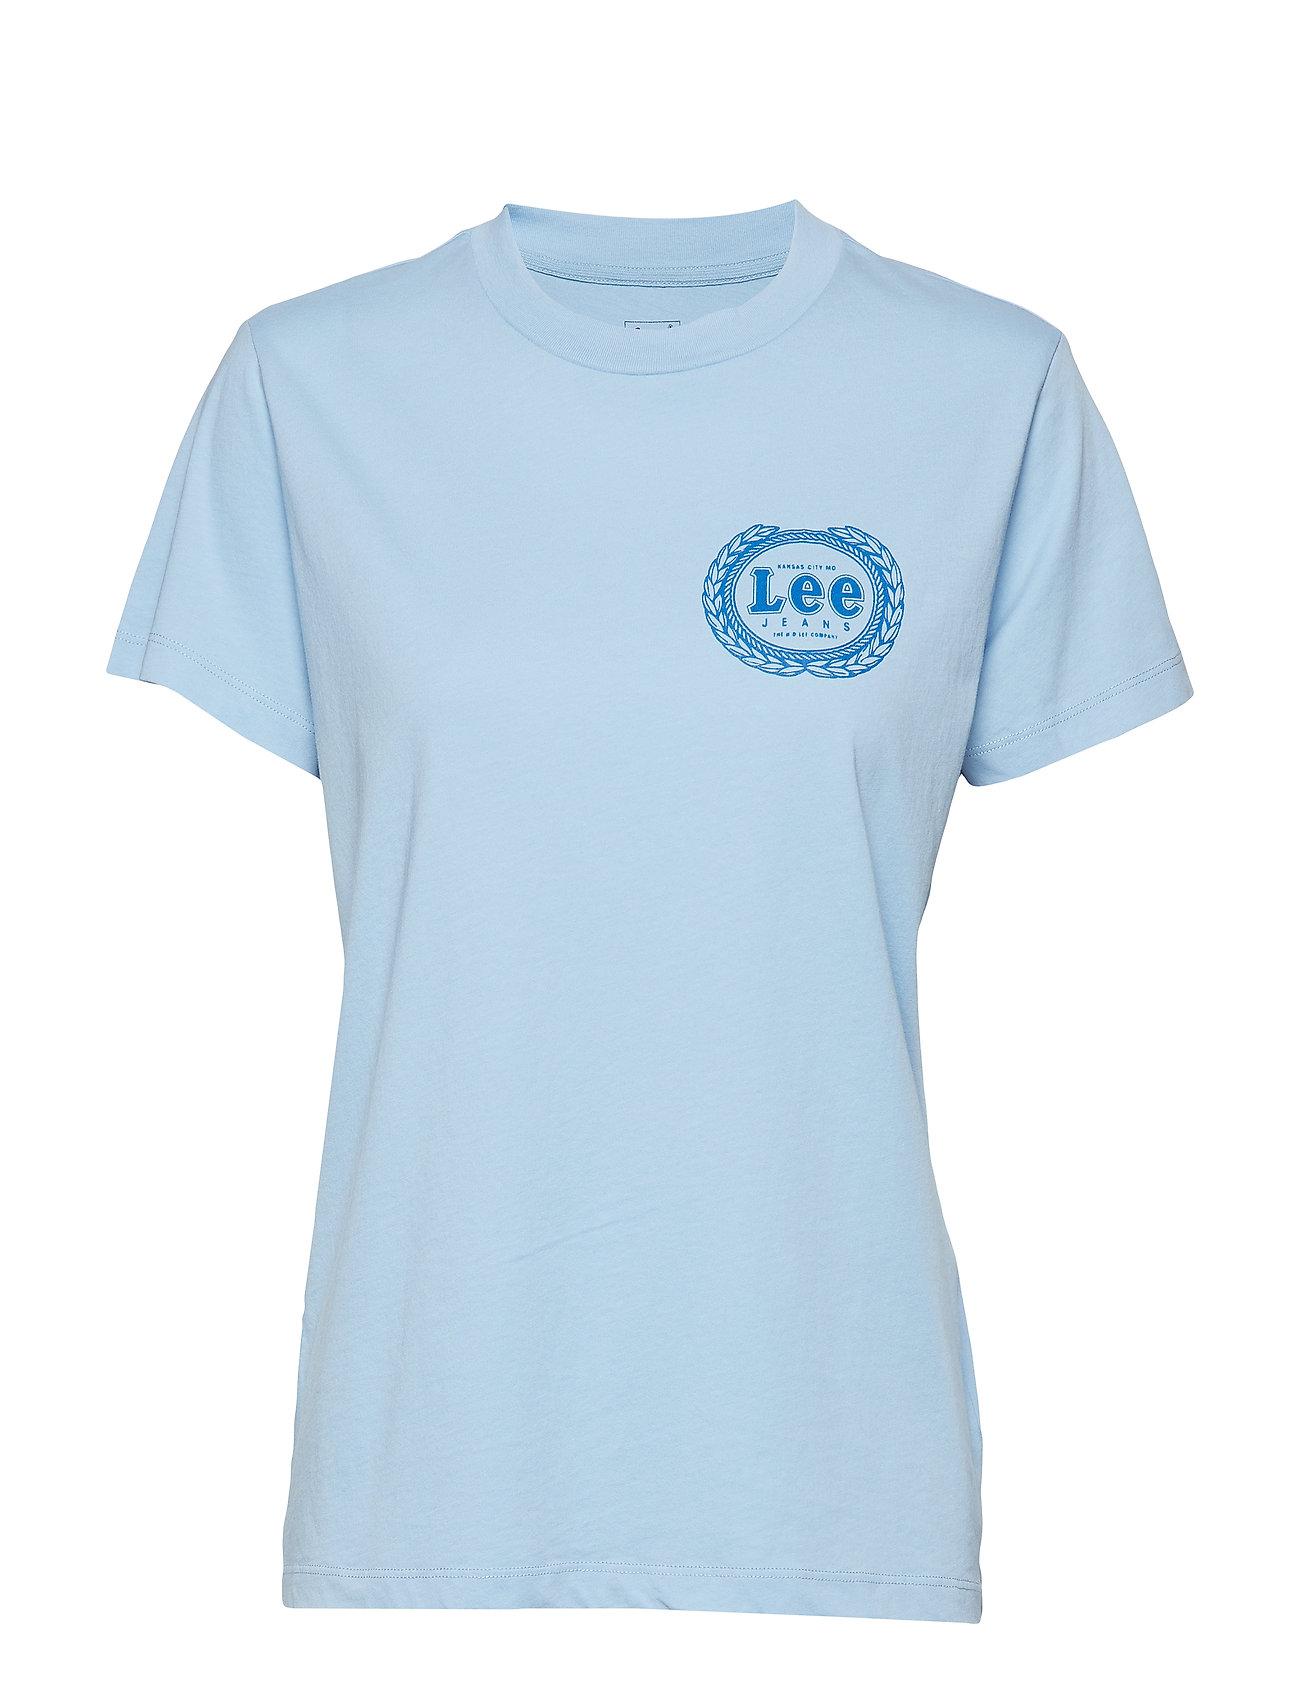 Lee Jeans EMBLEM T - SKY BLUE